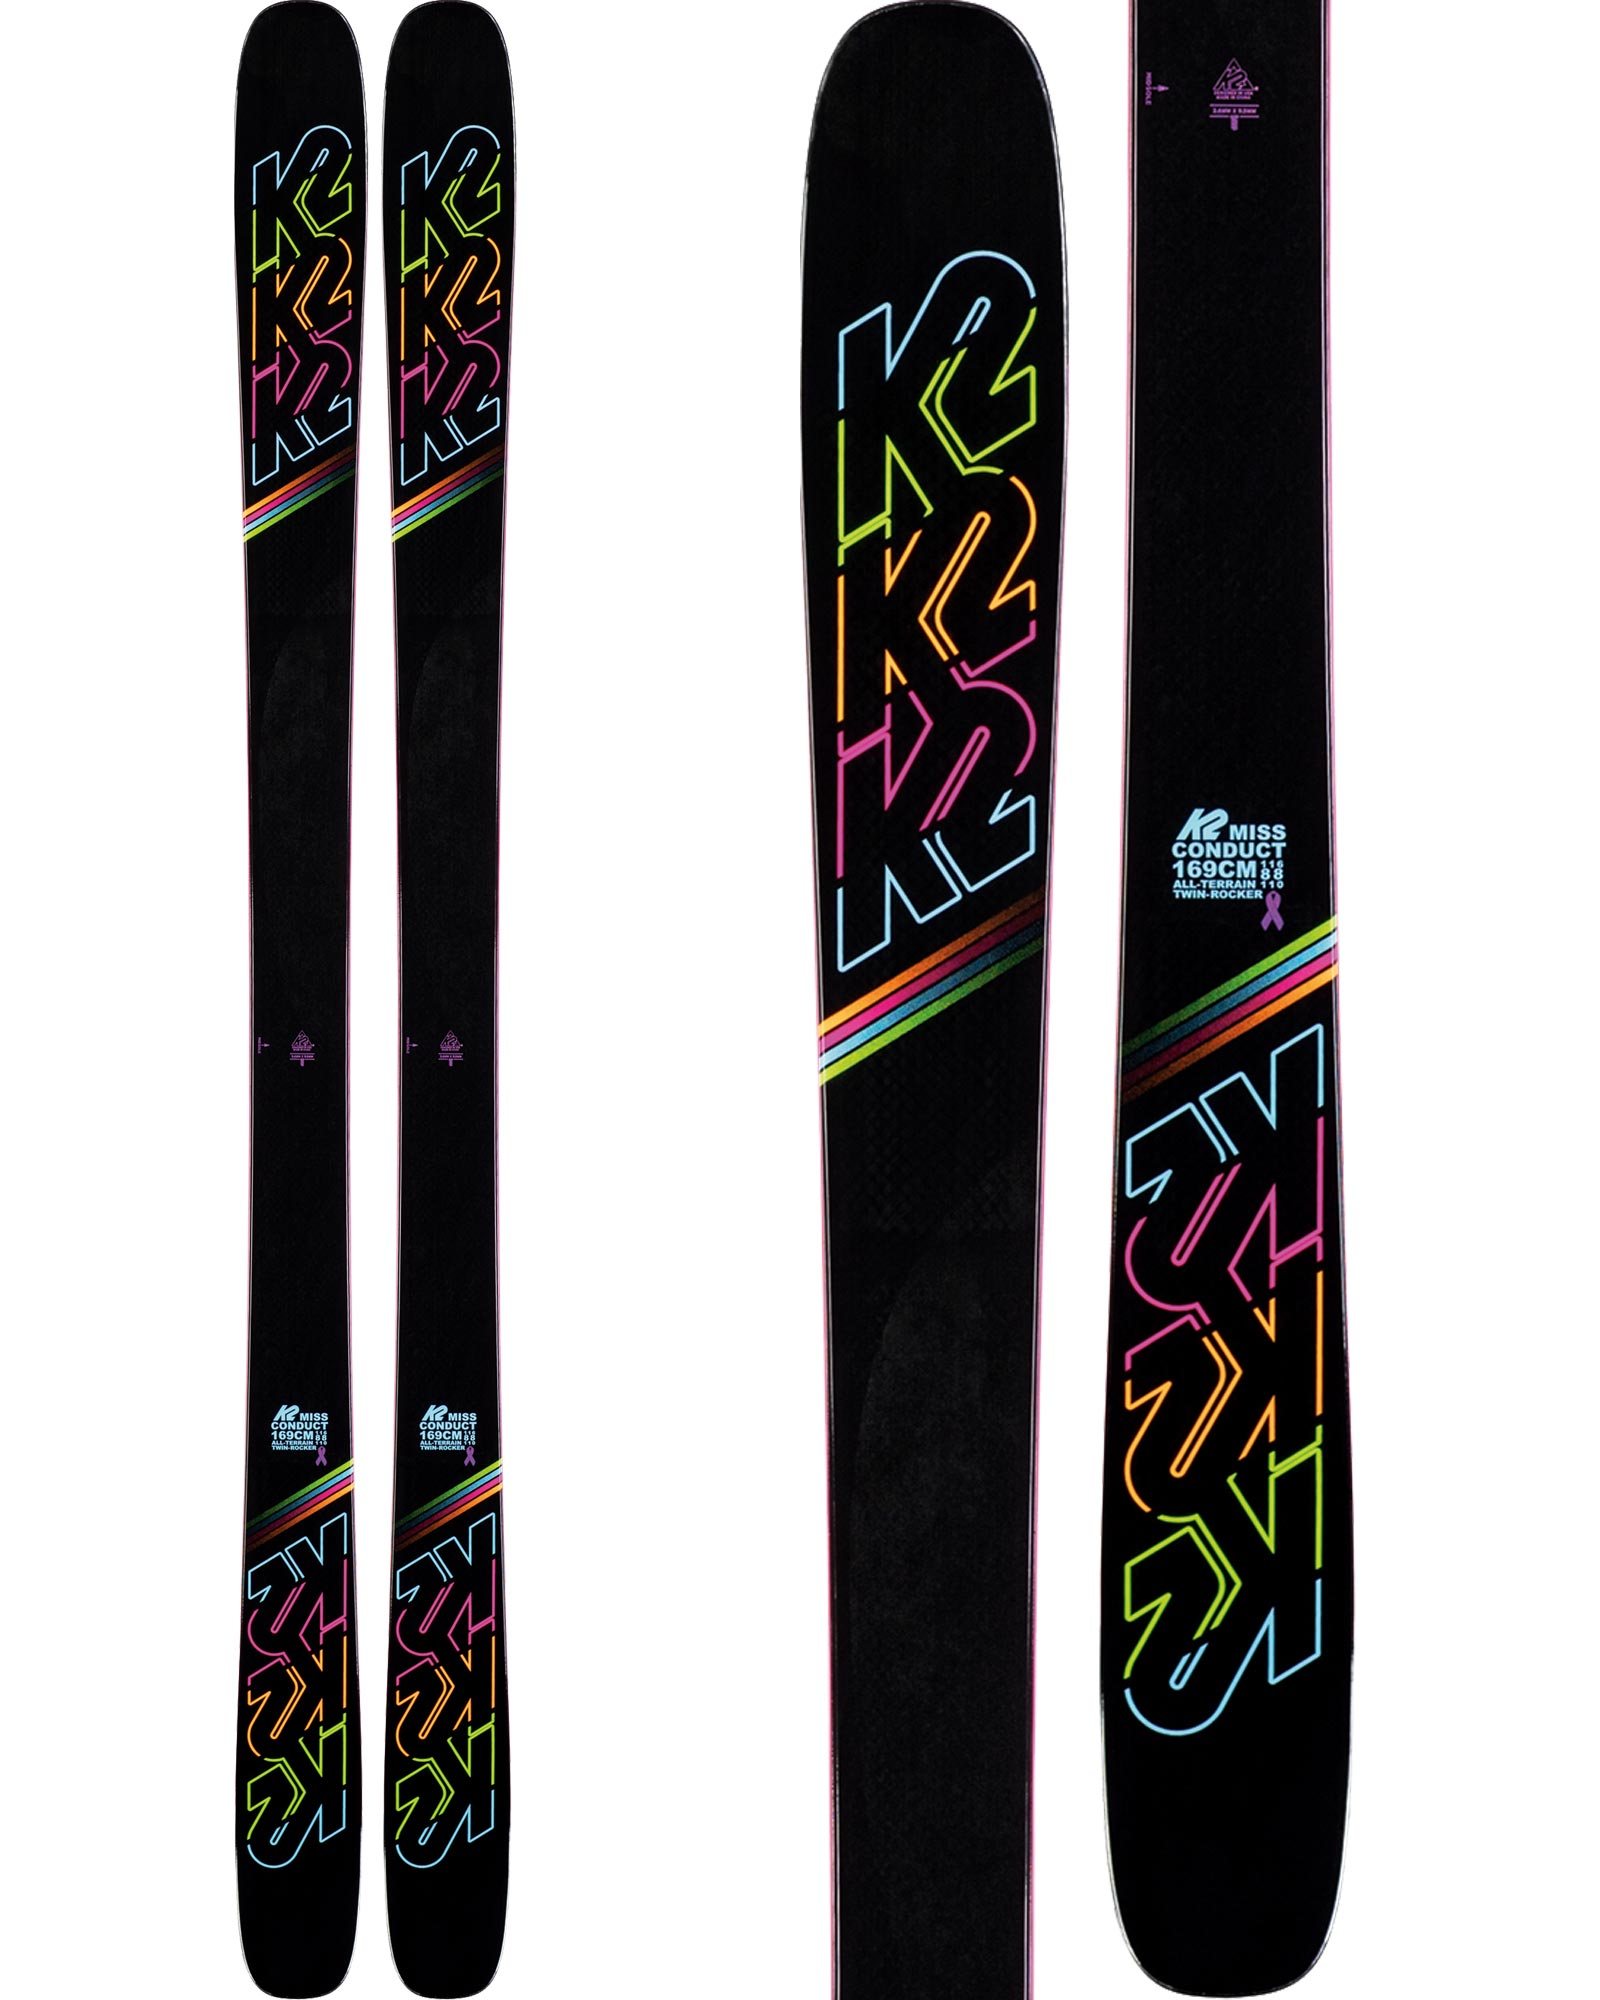 K2 Women's MissConduct Freestyle Skis 2019 / 2020 0